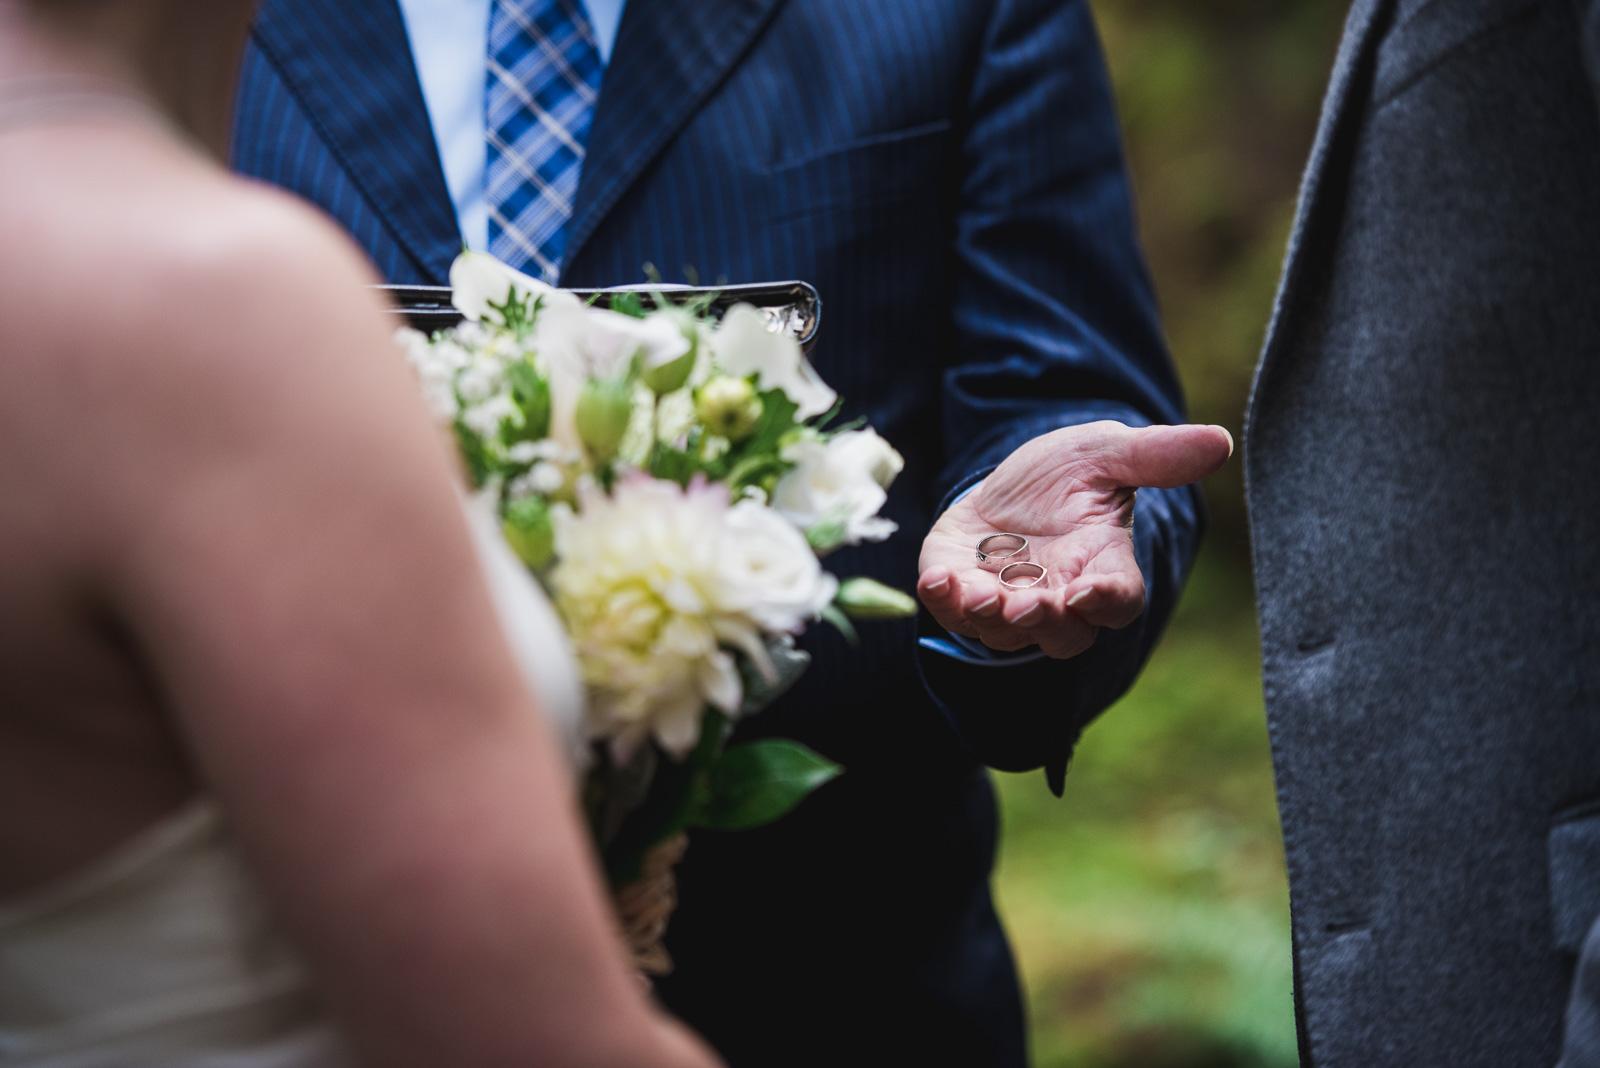 vancouver-island-wedding-photographers-cliff-gilker-park-smugglers-cove-elopement-11.jpg